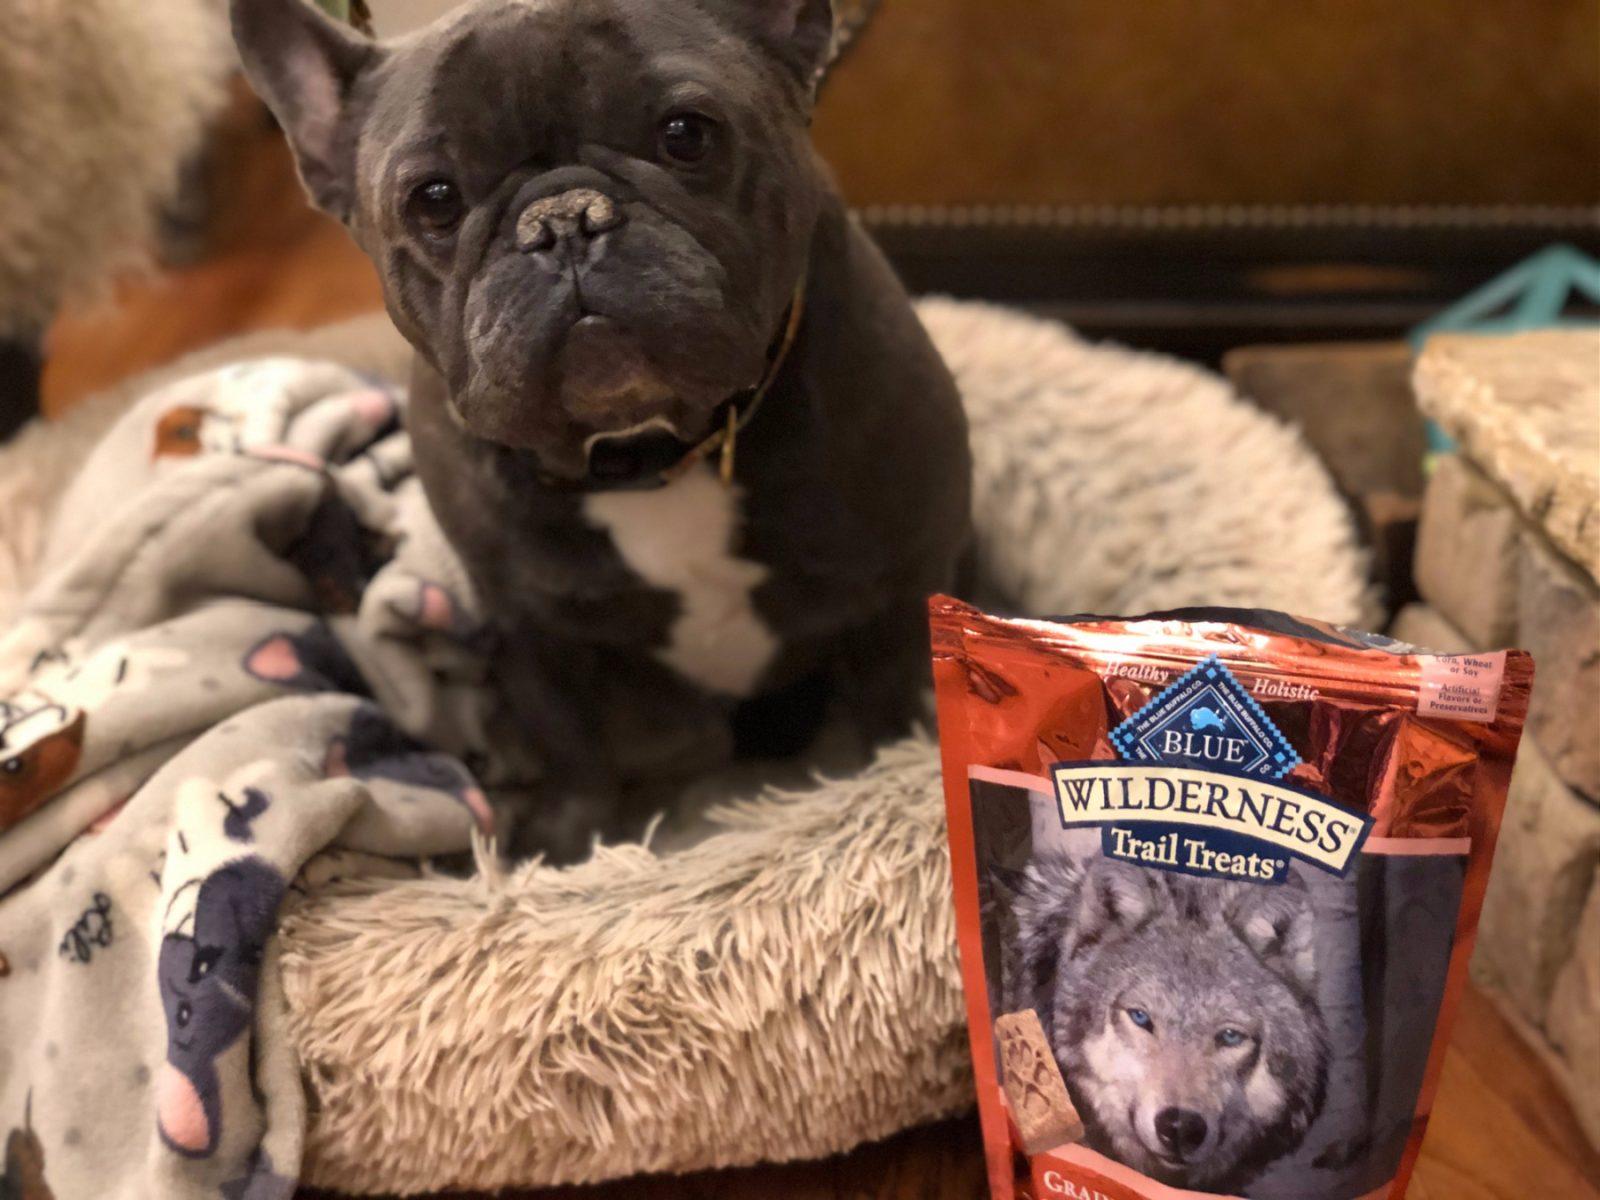 Blue Wilderness Crunchy Dog Treats Just $1.75 At Publix on I Heart Publix